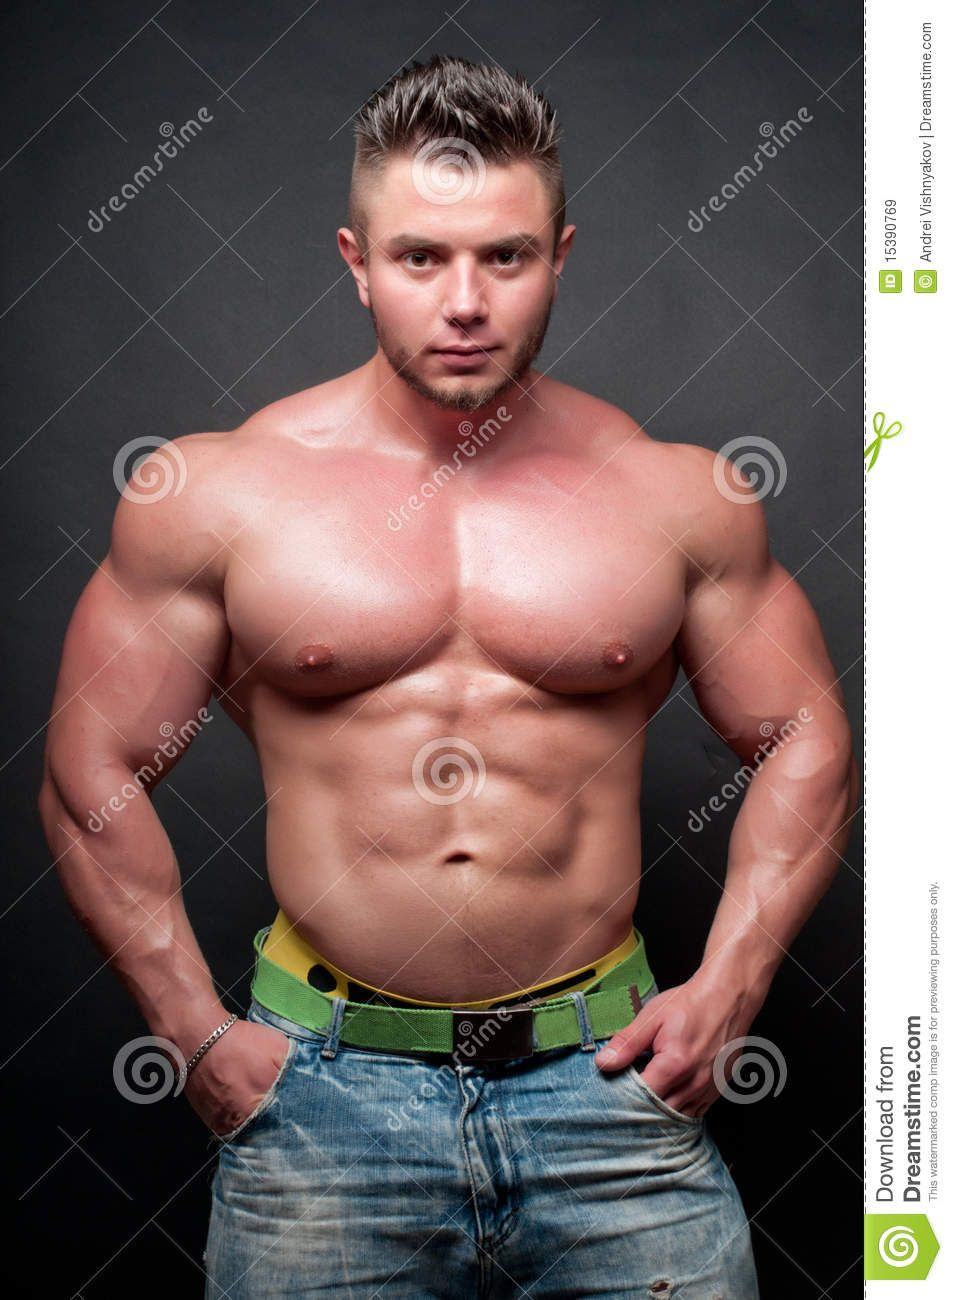 Pin de Ágnes Nyisztor en Bodybuilding   Pinterest